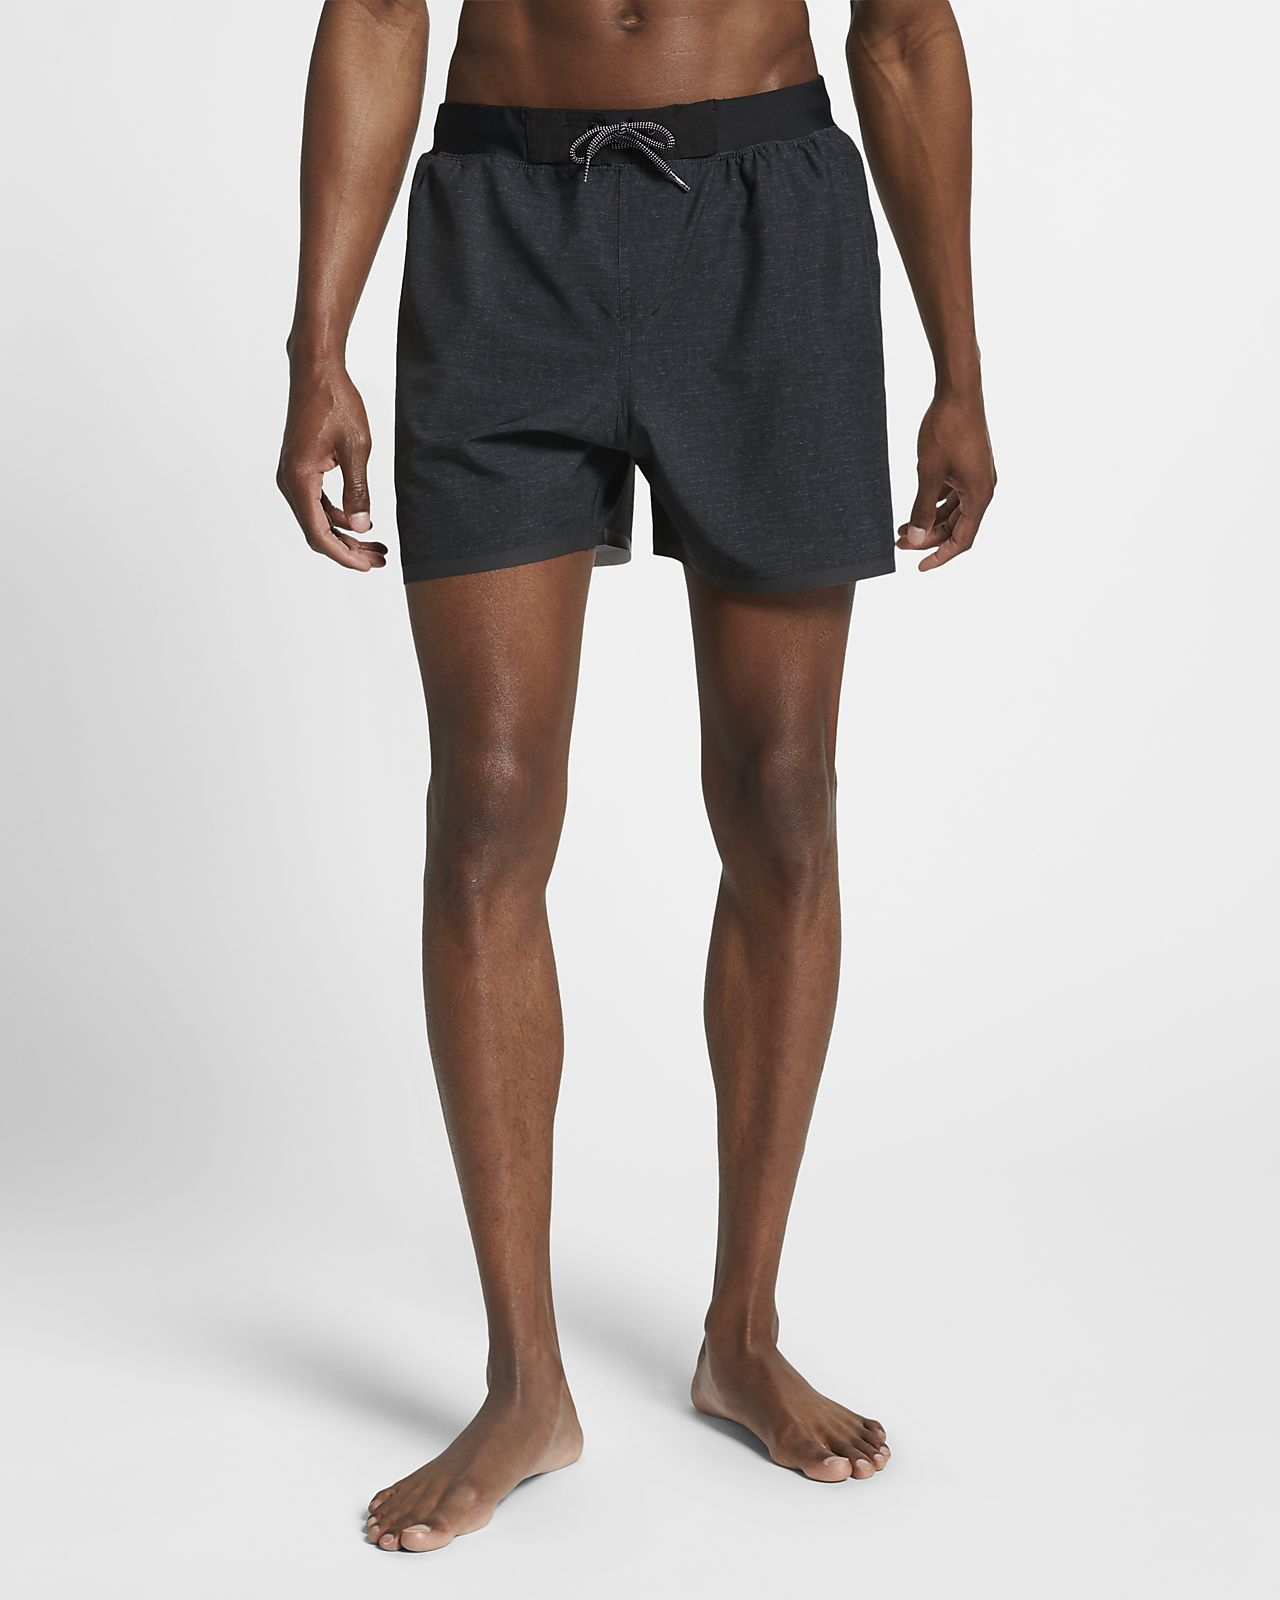 1ddc0d6b1 Nike Linen Blade Volley 13 cm-es férfi rövidnadrág. Nike.com HU